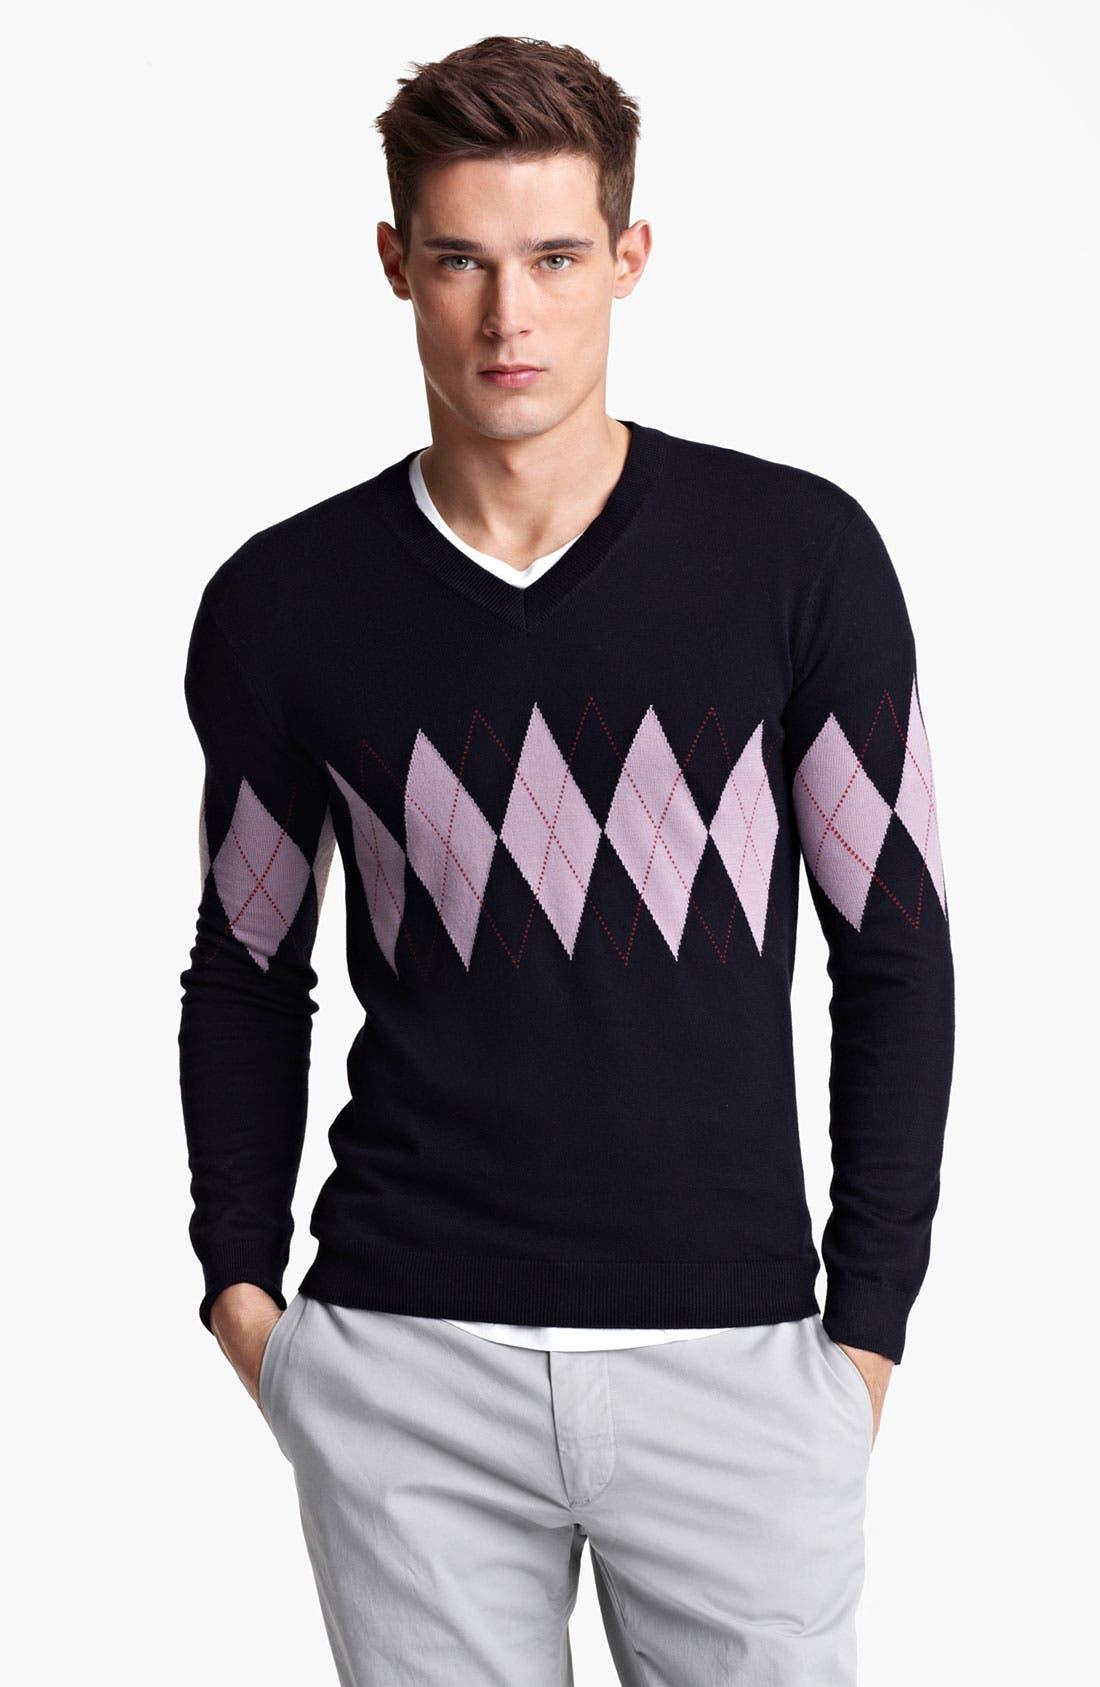 Alternate Image 1 Selected - Pringle of Scotland Argyle V-Neck Sweater